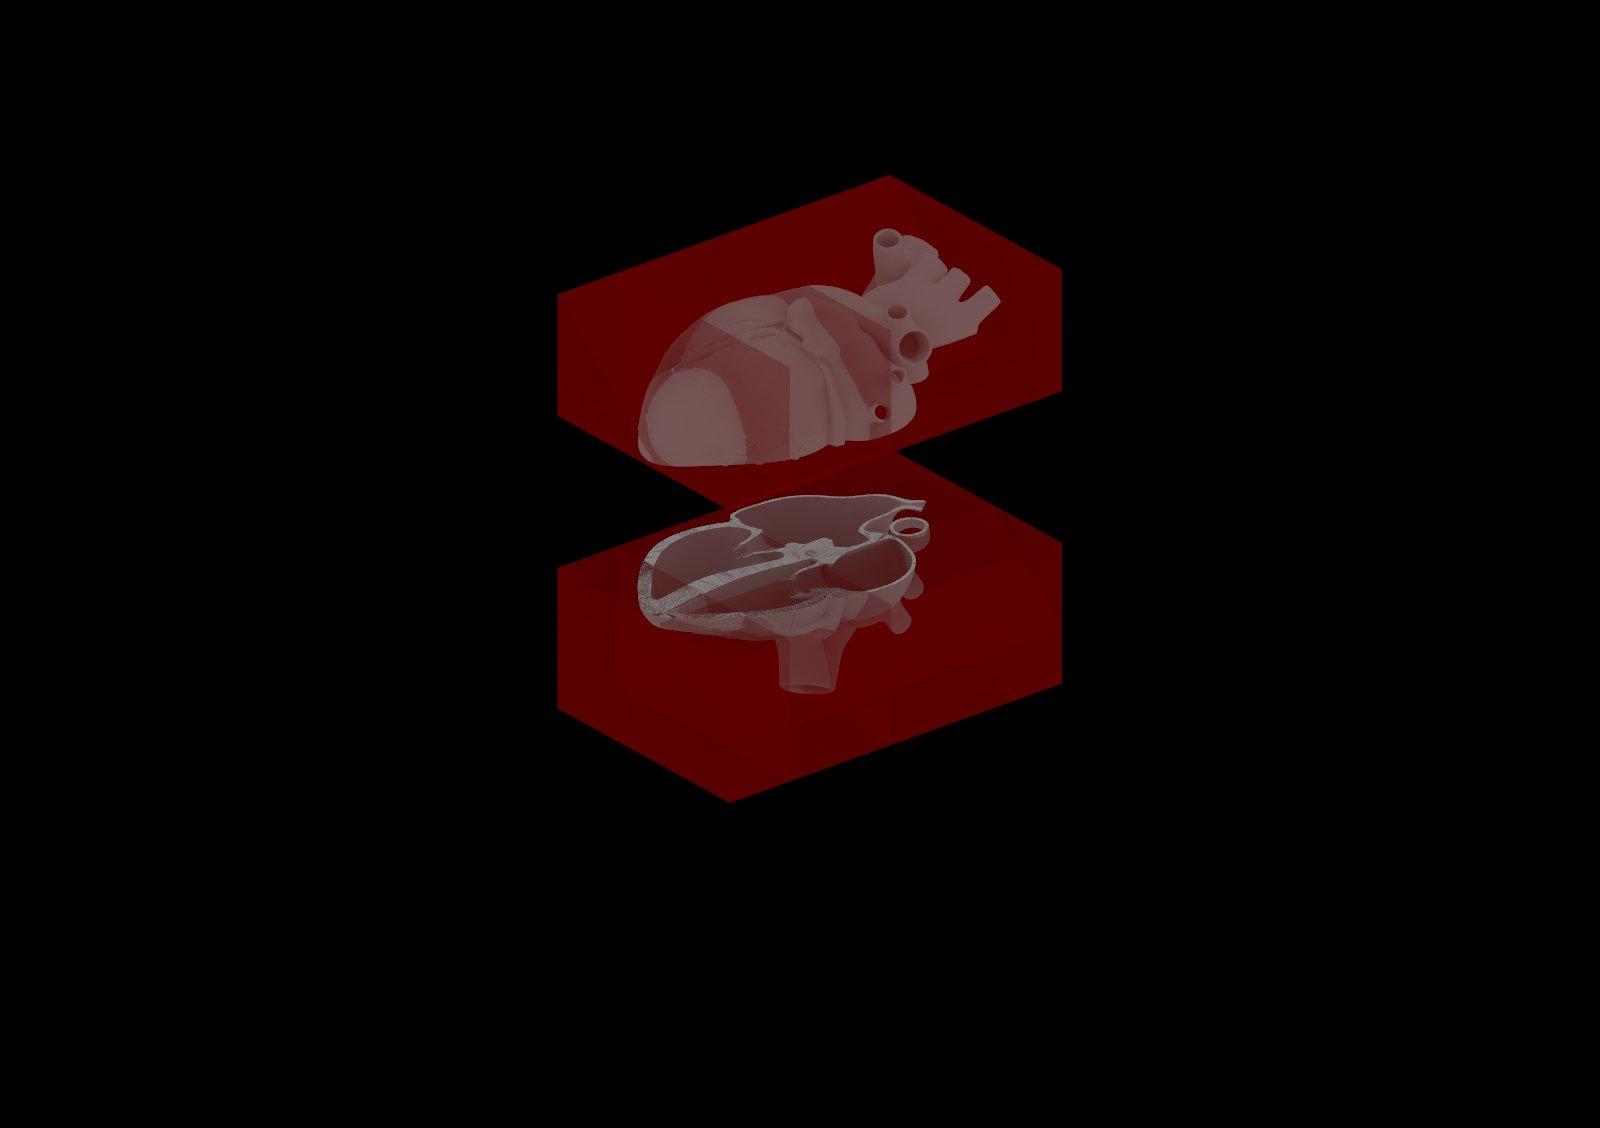 HeartPuzzle_Page_7.jpg